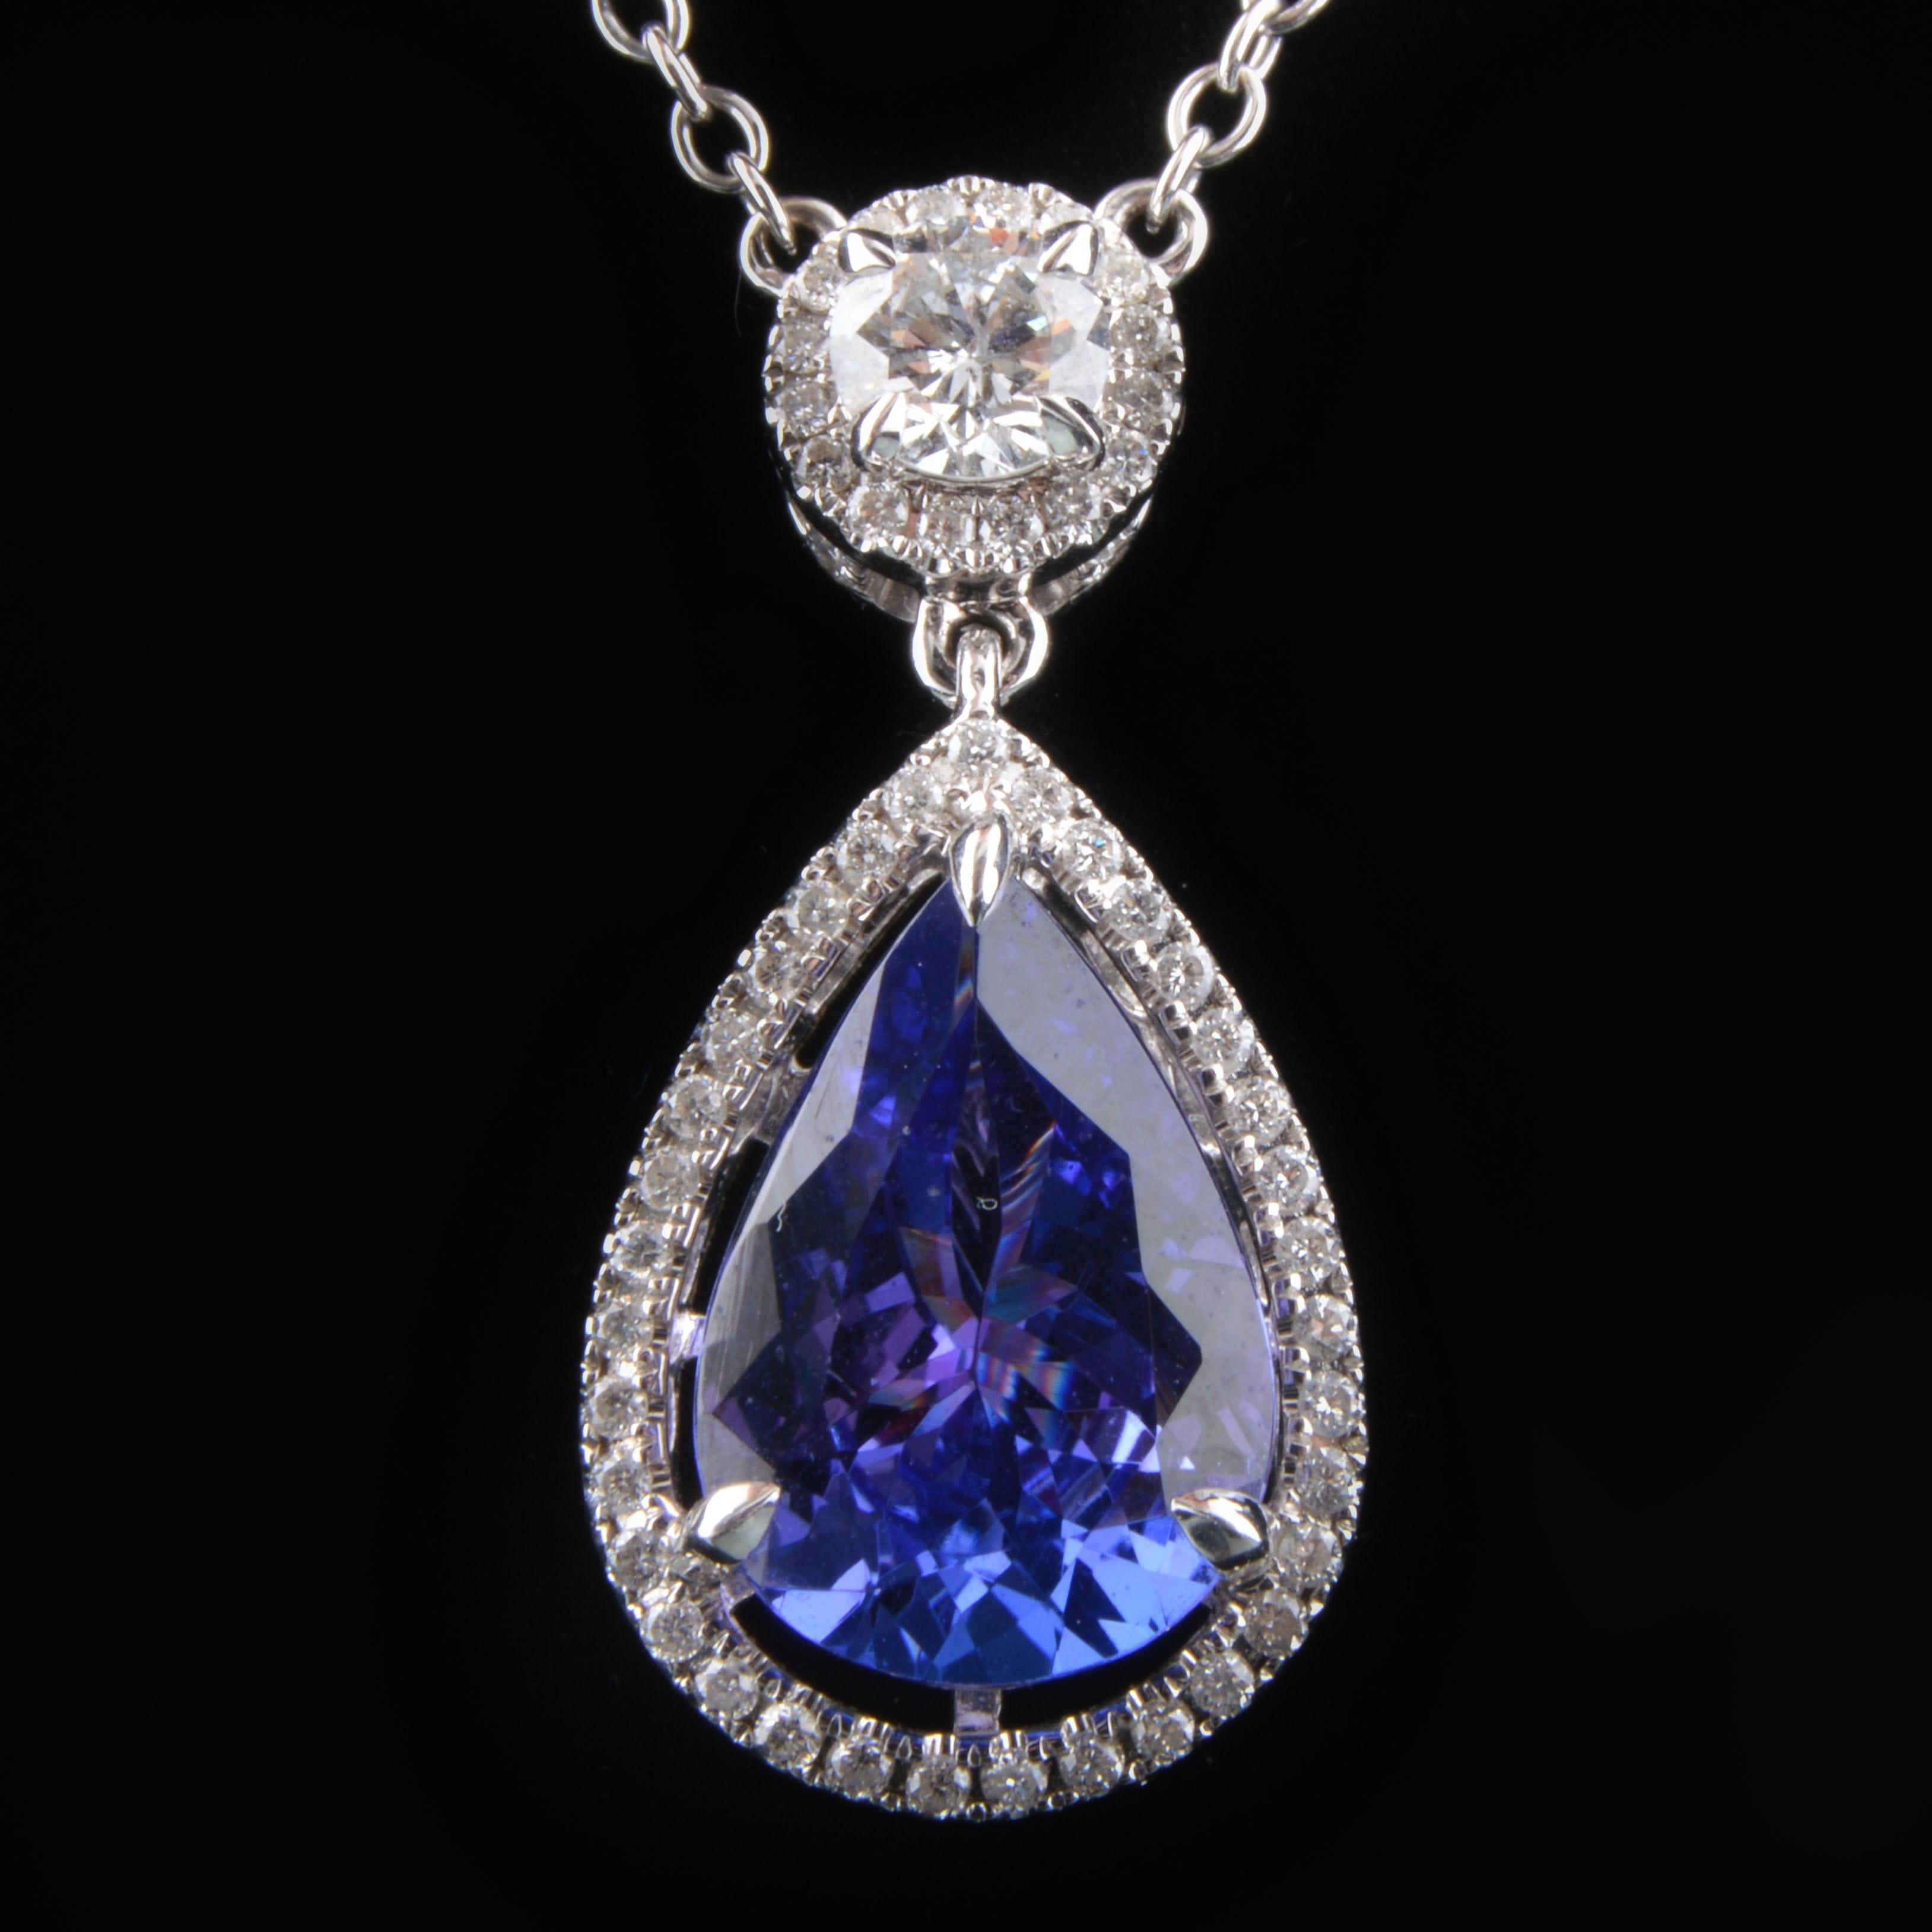 18K White Gold Tanzanite and Diamond Pendant Necklace